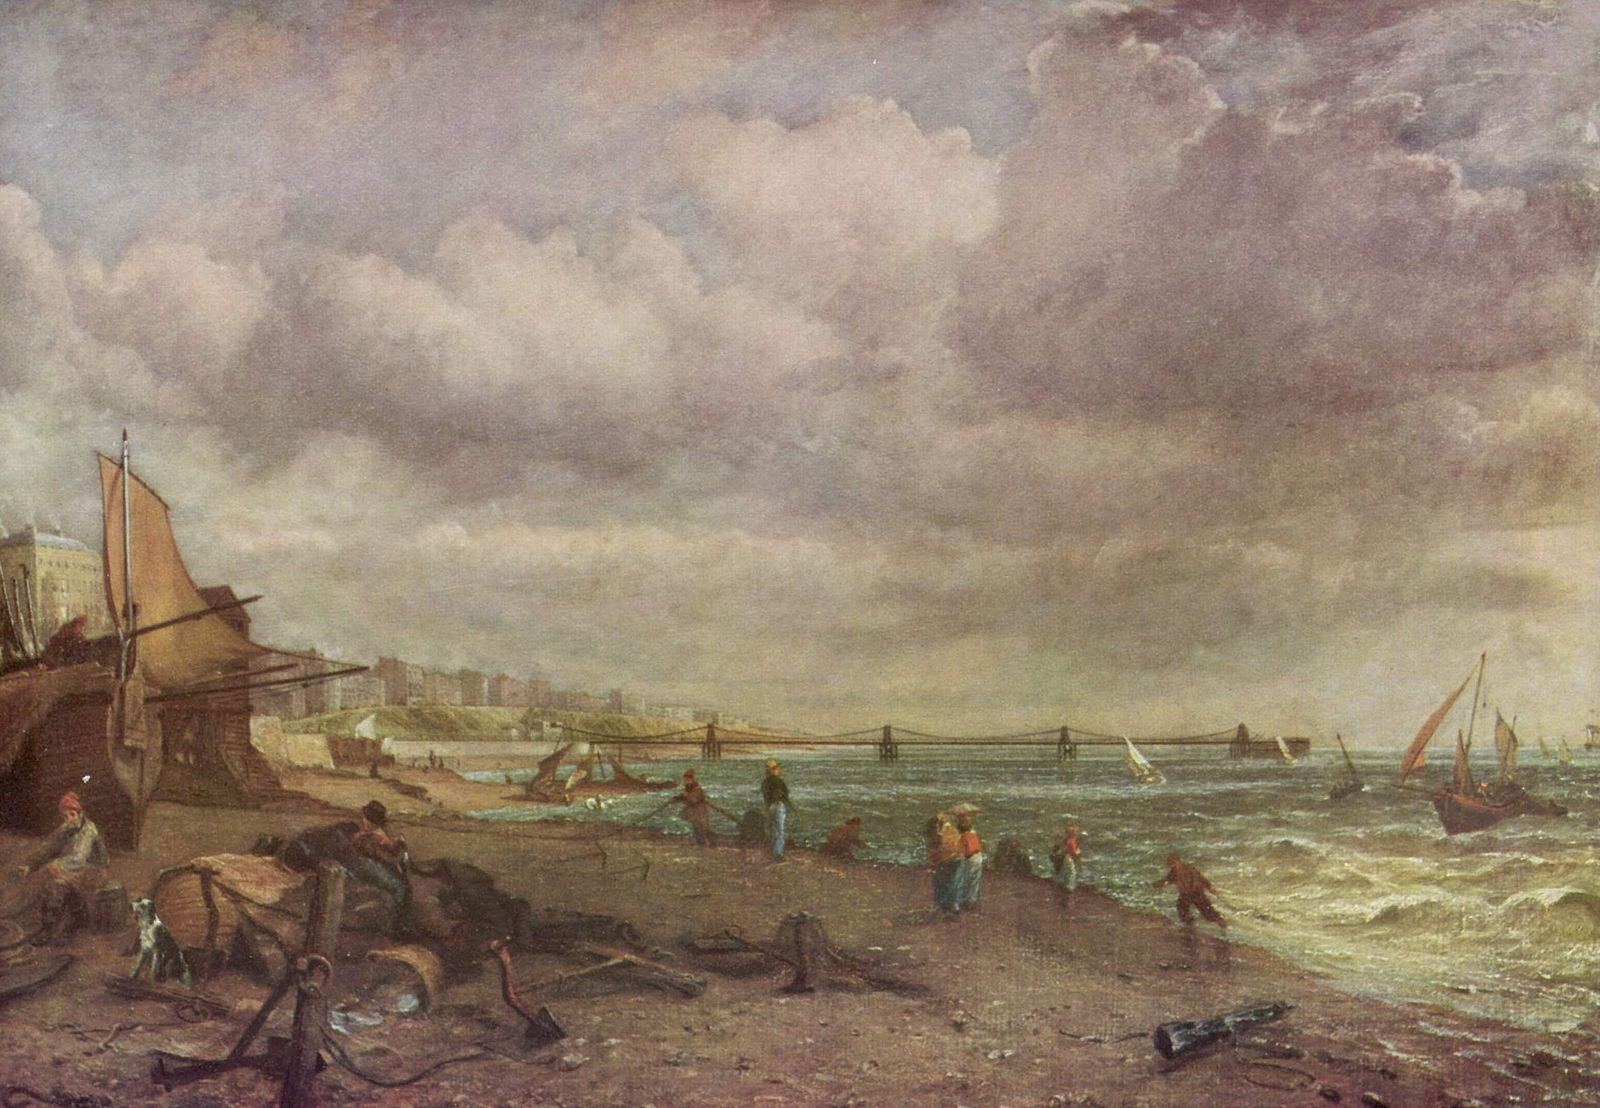 John Constable. The Chain Pier Brighton, 1824-1827. Oil on canvas.